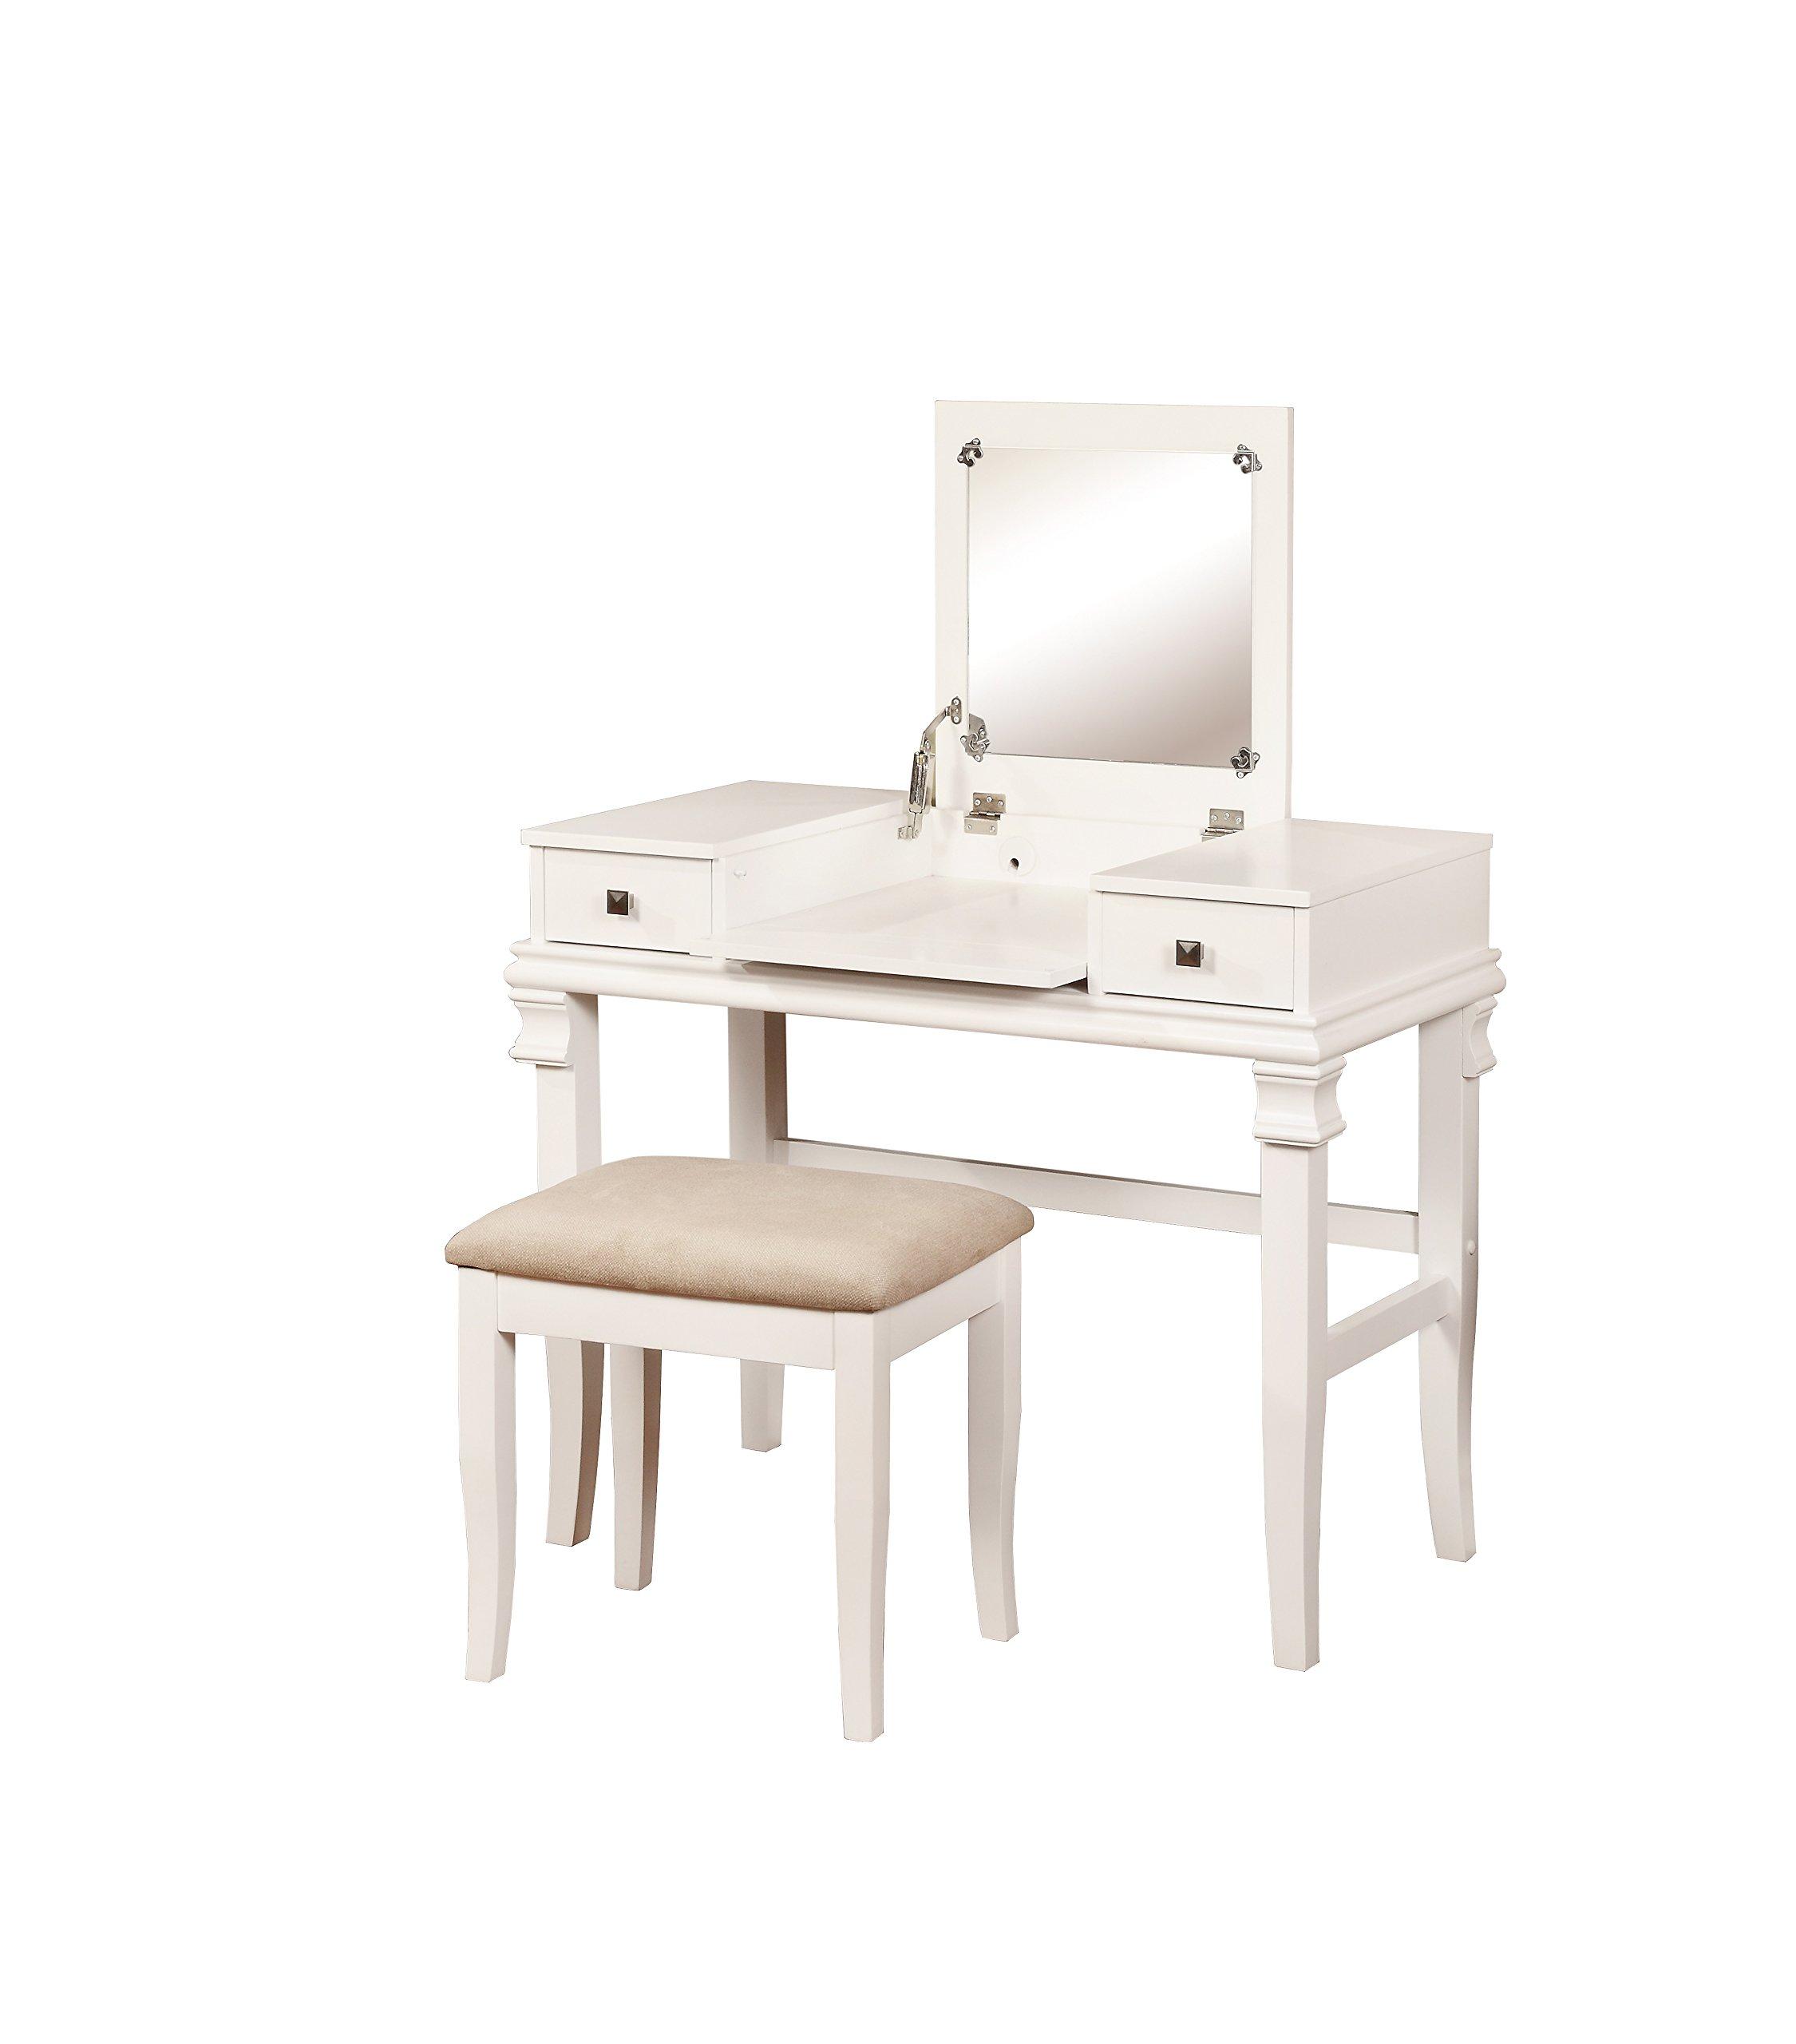 Linon Vanity Set, Angela White